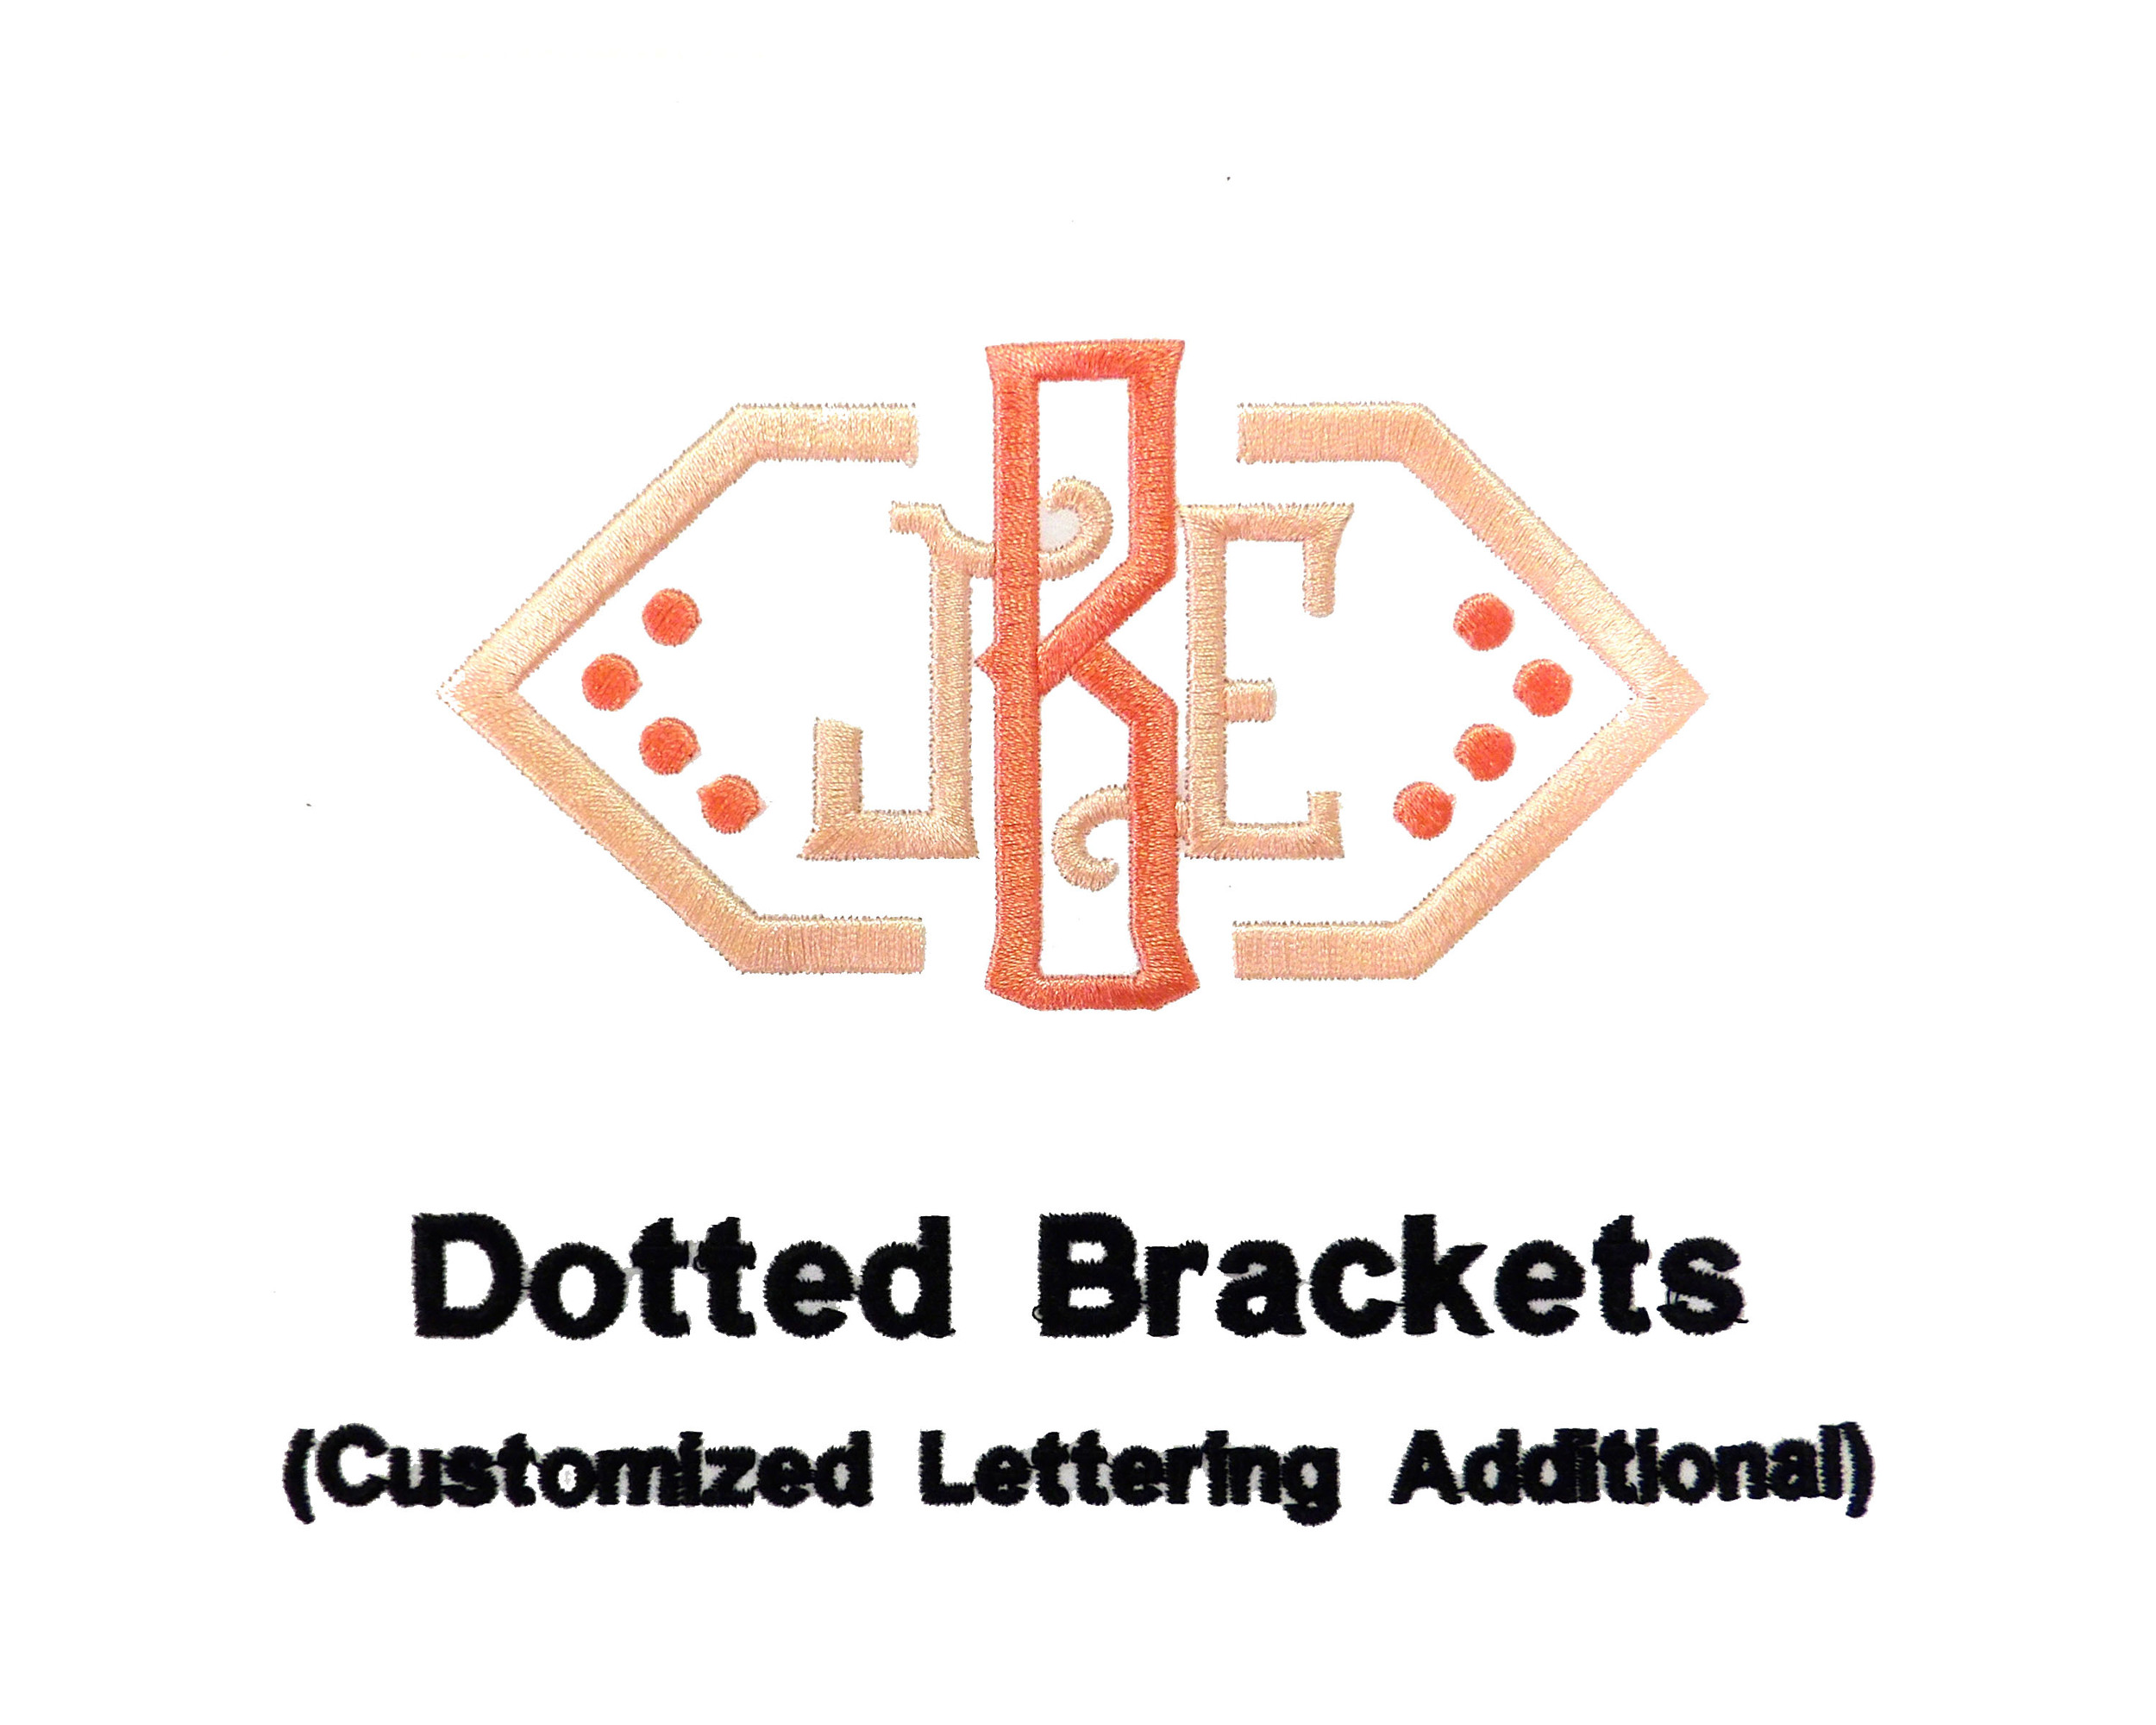 Dotted Brackets.jpg